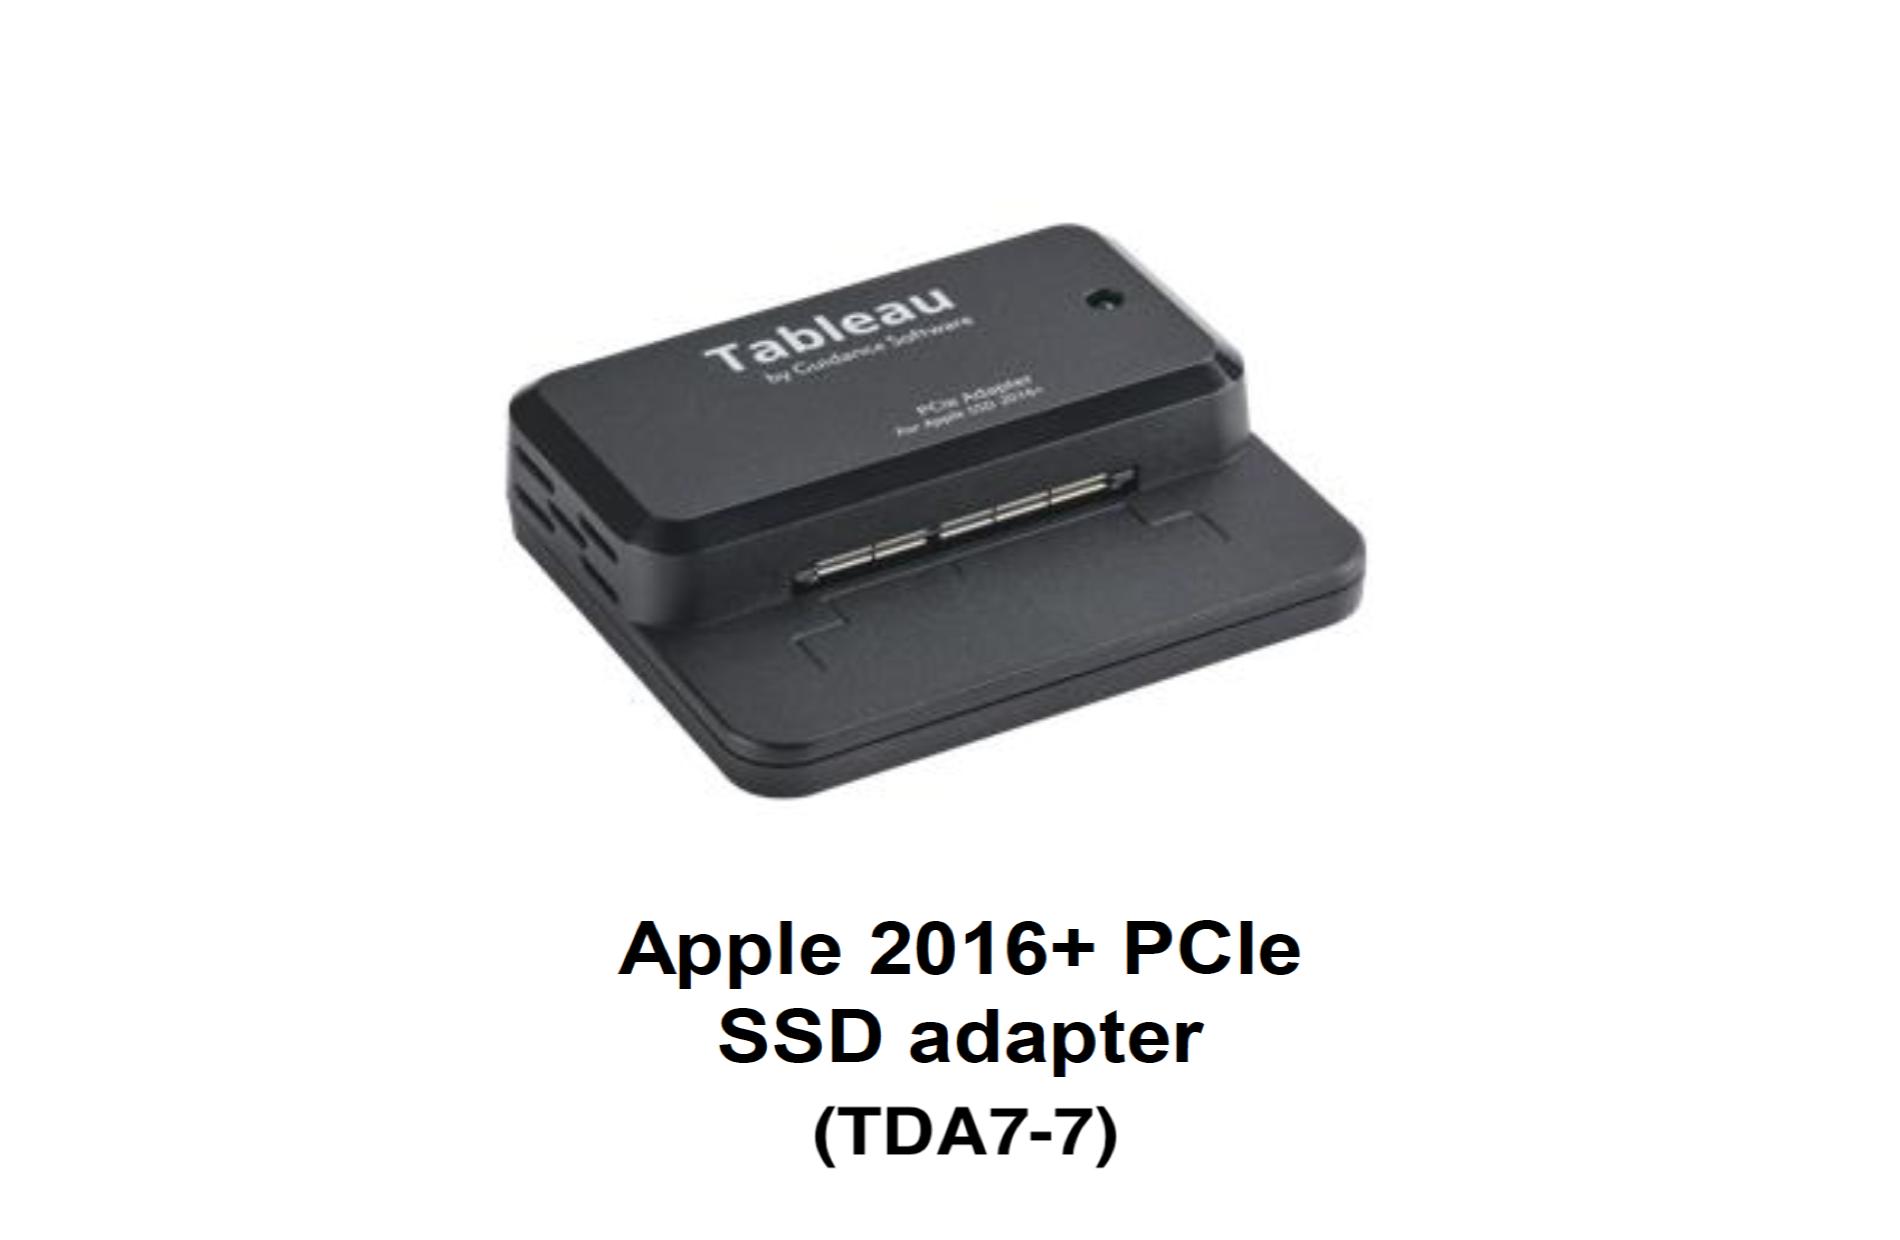 TDA7-7 Apple 2016+ PCIe SSD Adapter